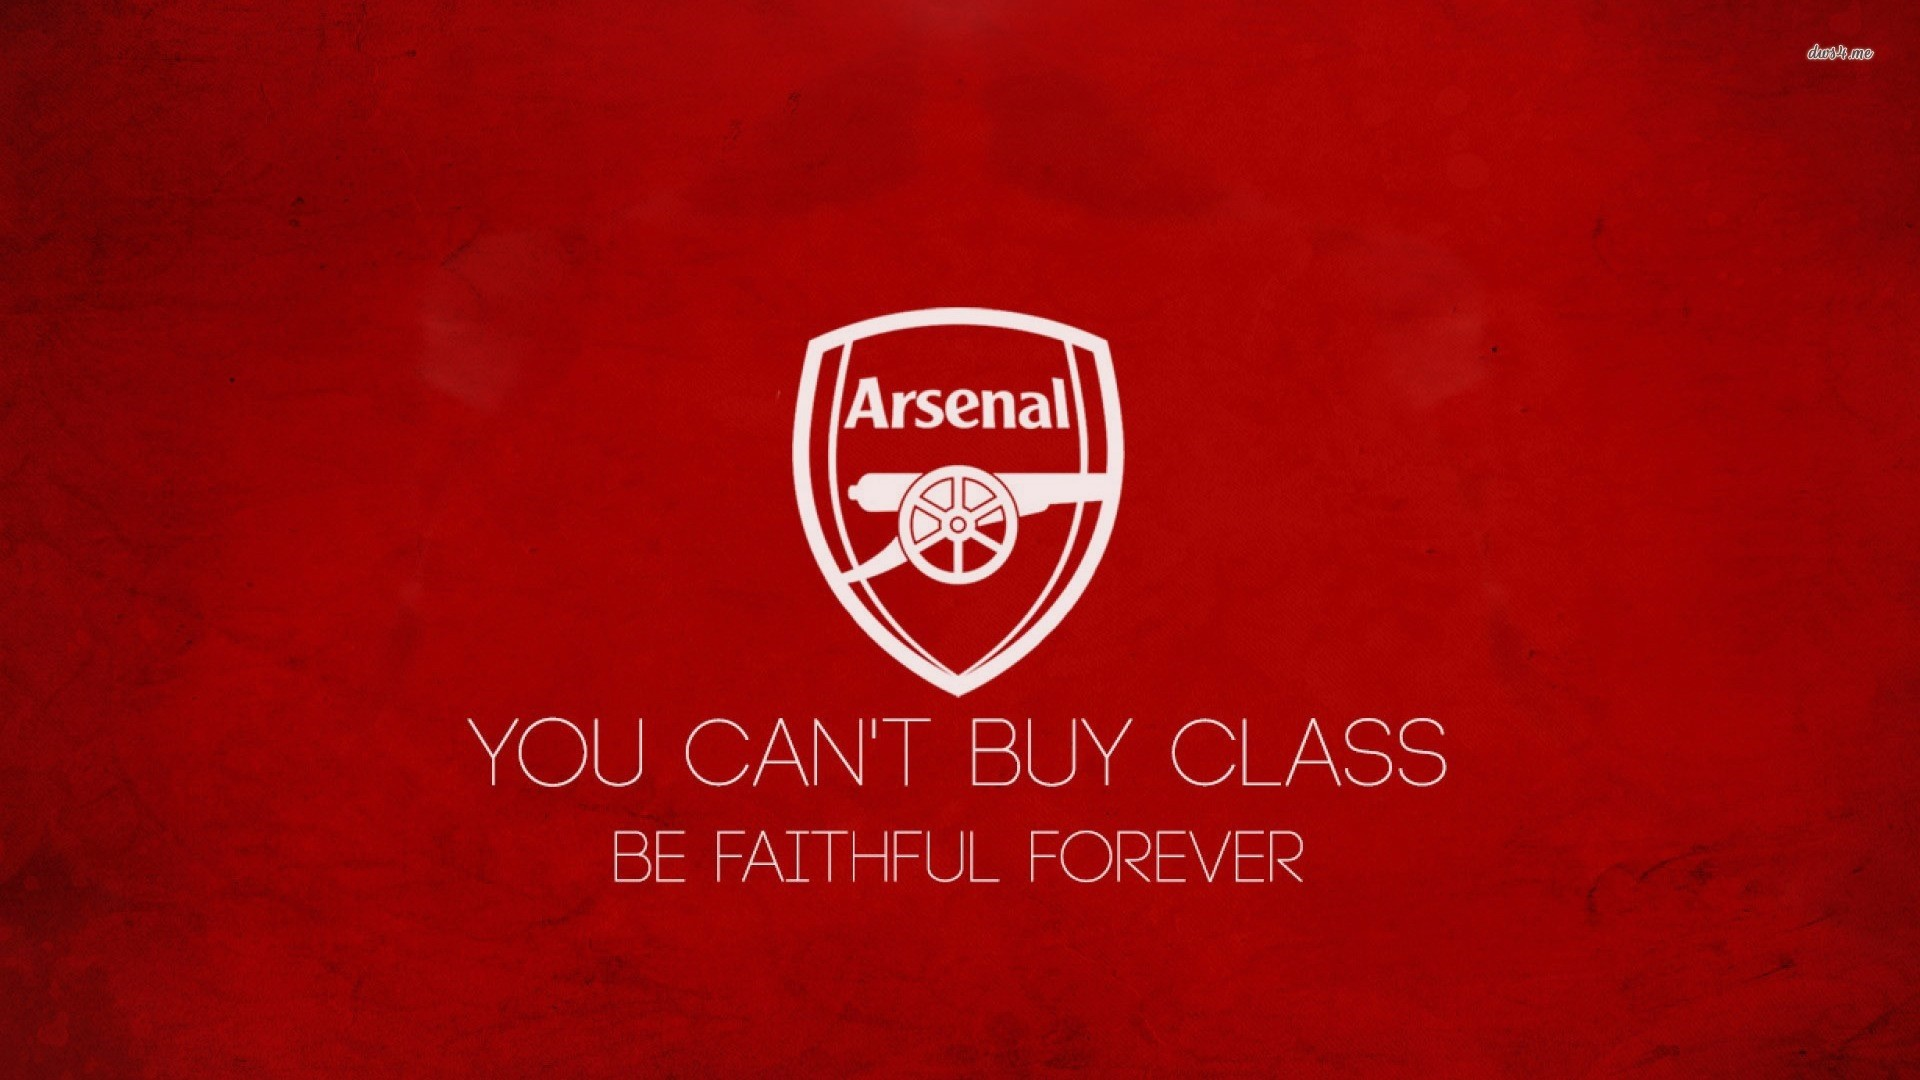 Arsenal Wallpaper image hd